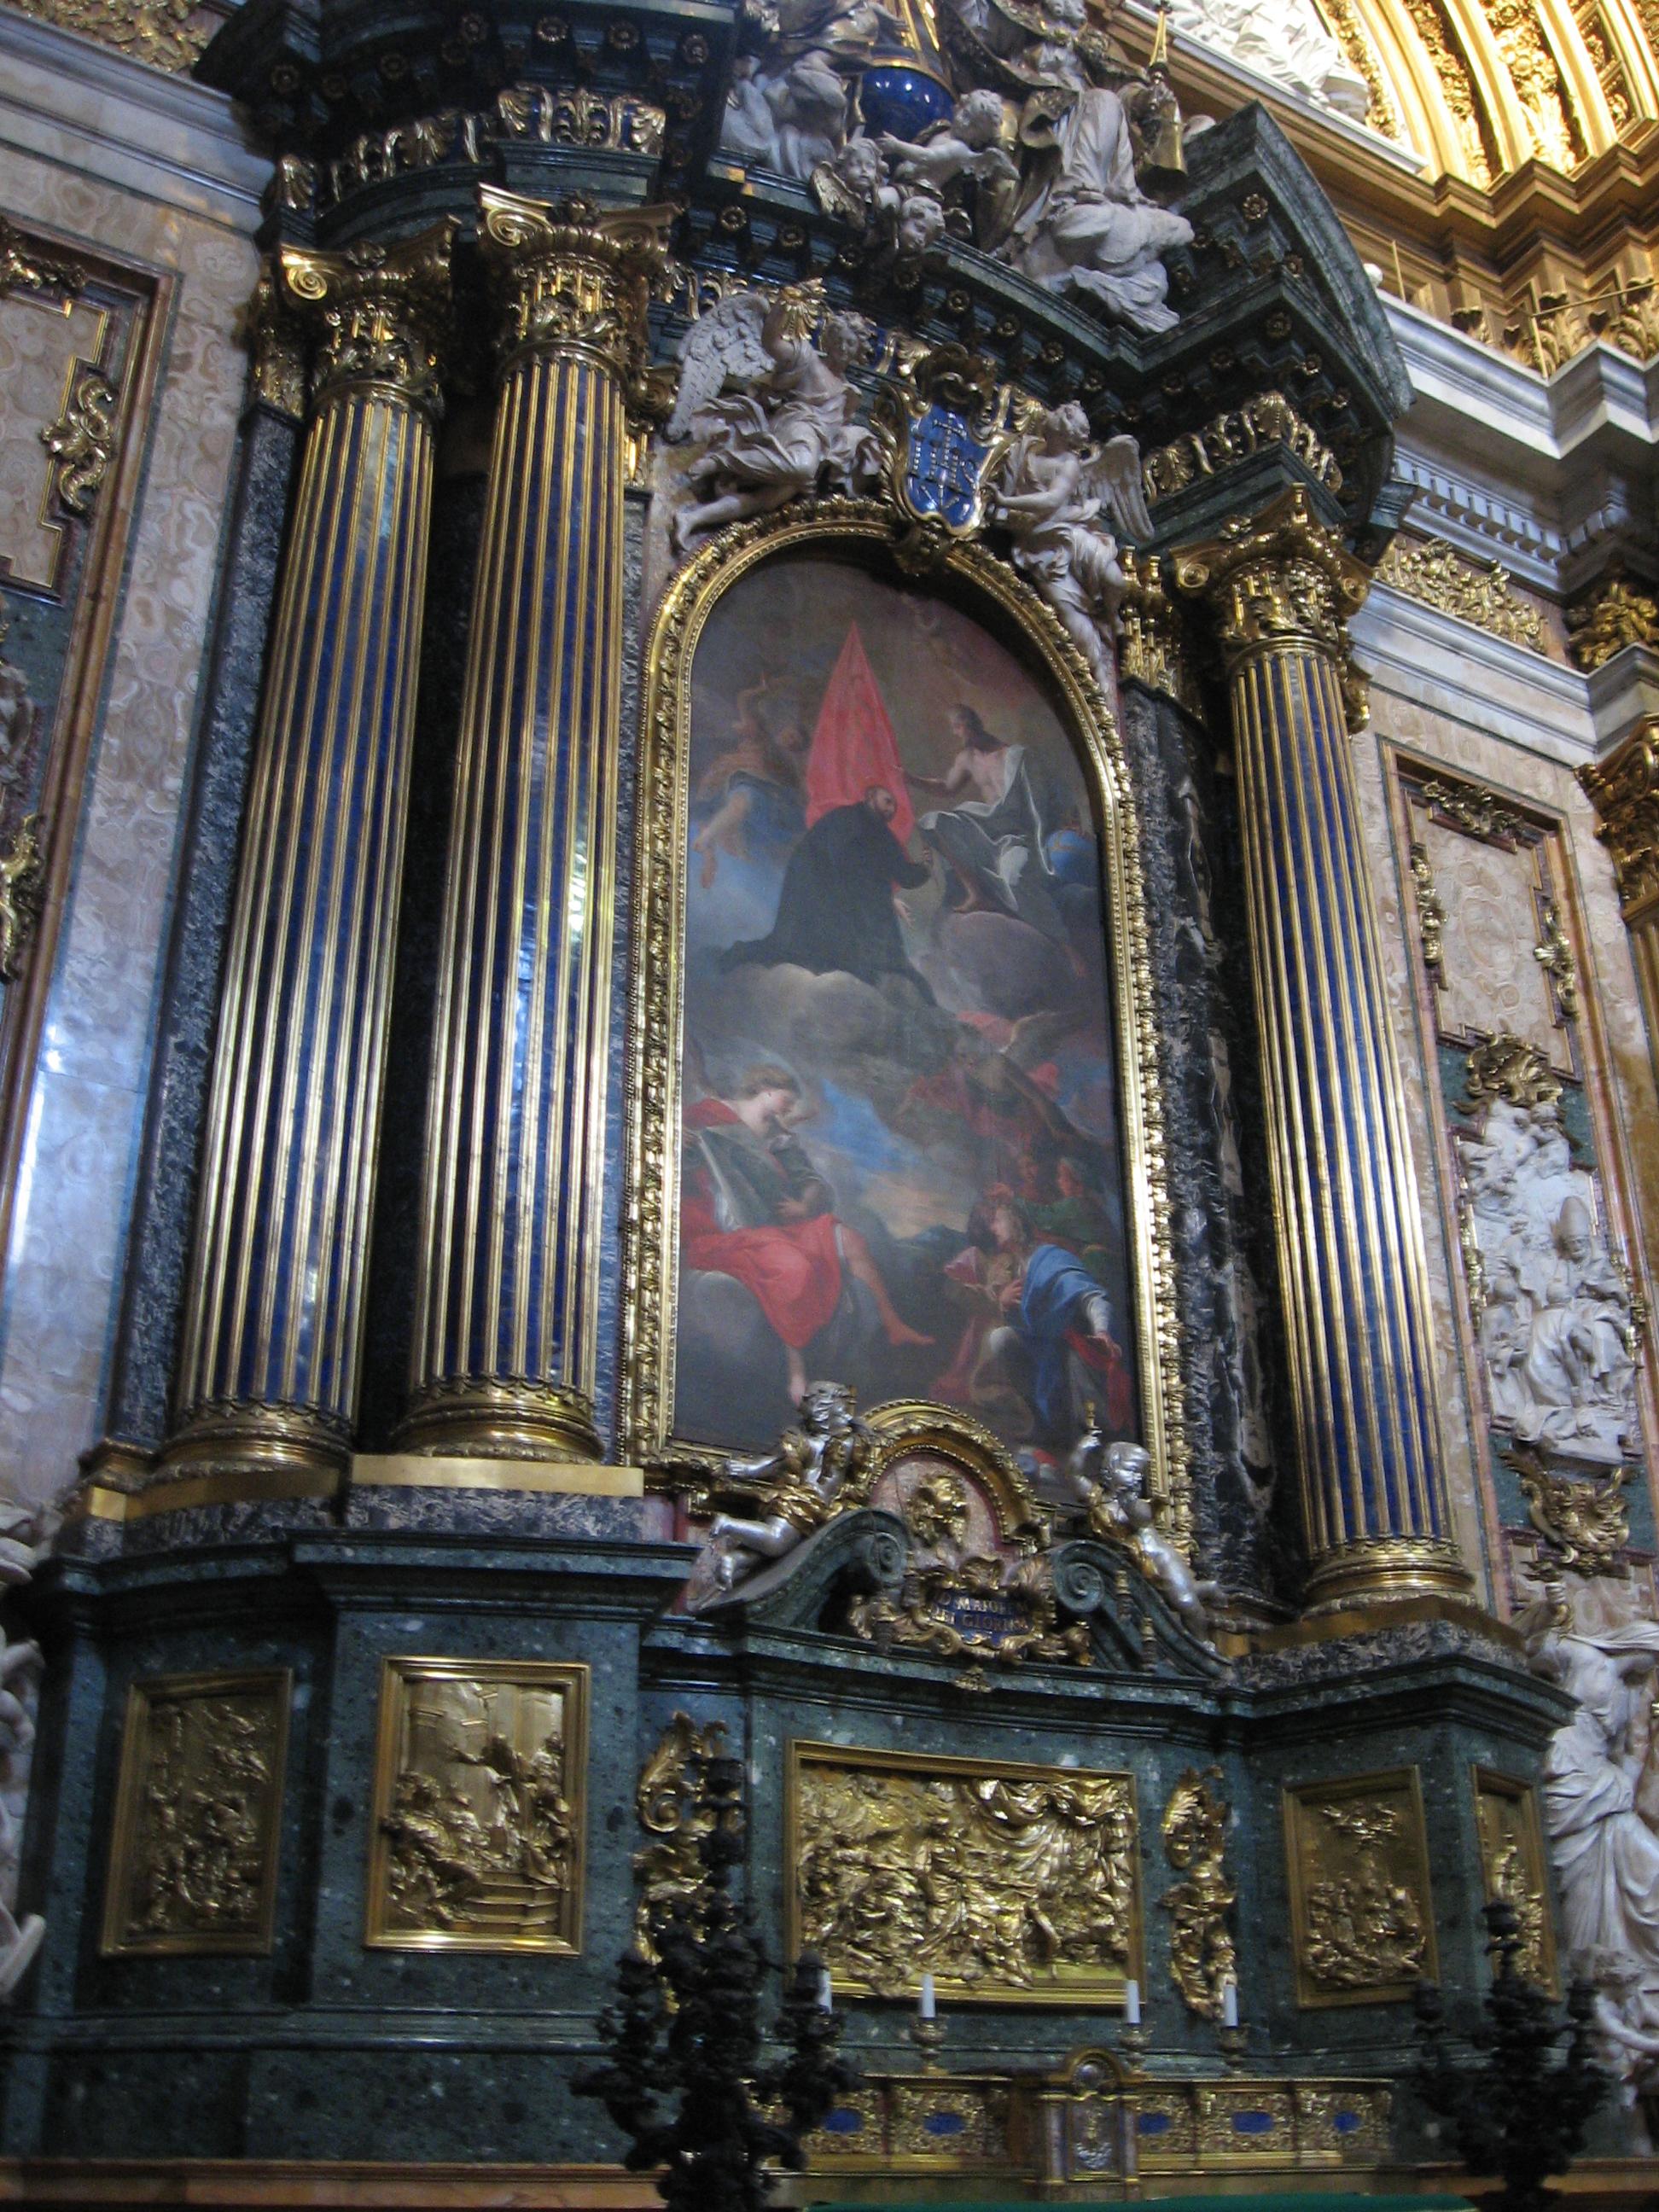 Altare_Chiesa_del_Ges%C3%B9.jpg